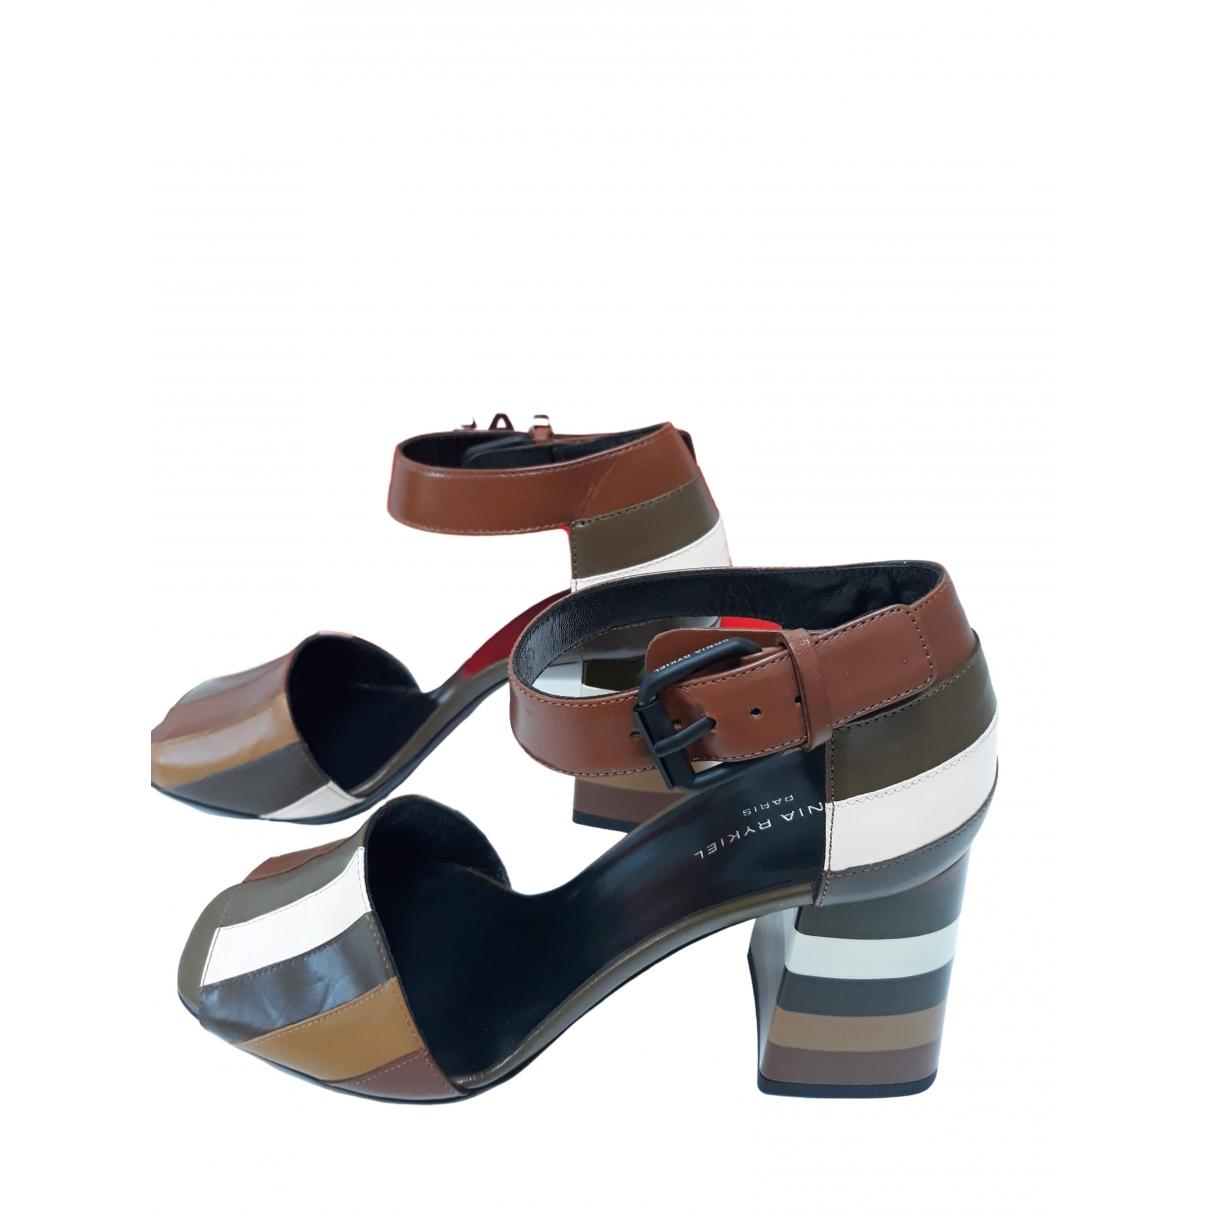 Sonia Rykiel - Sandales   pour femme en cuir - multicolore